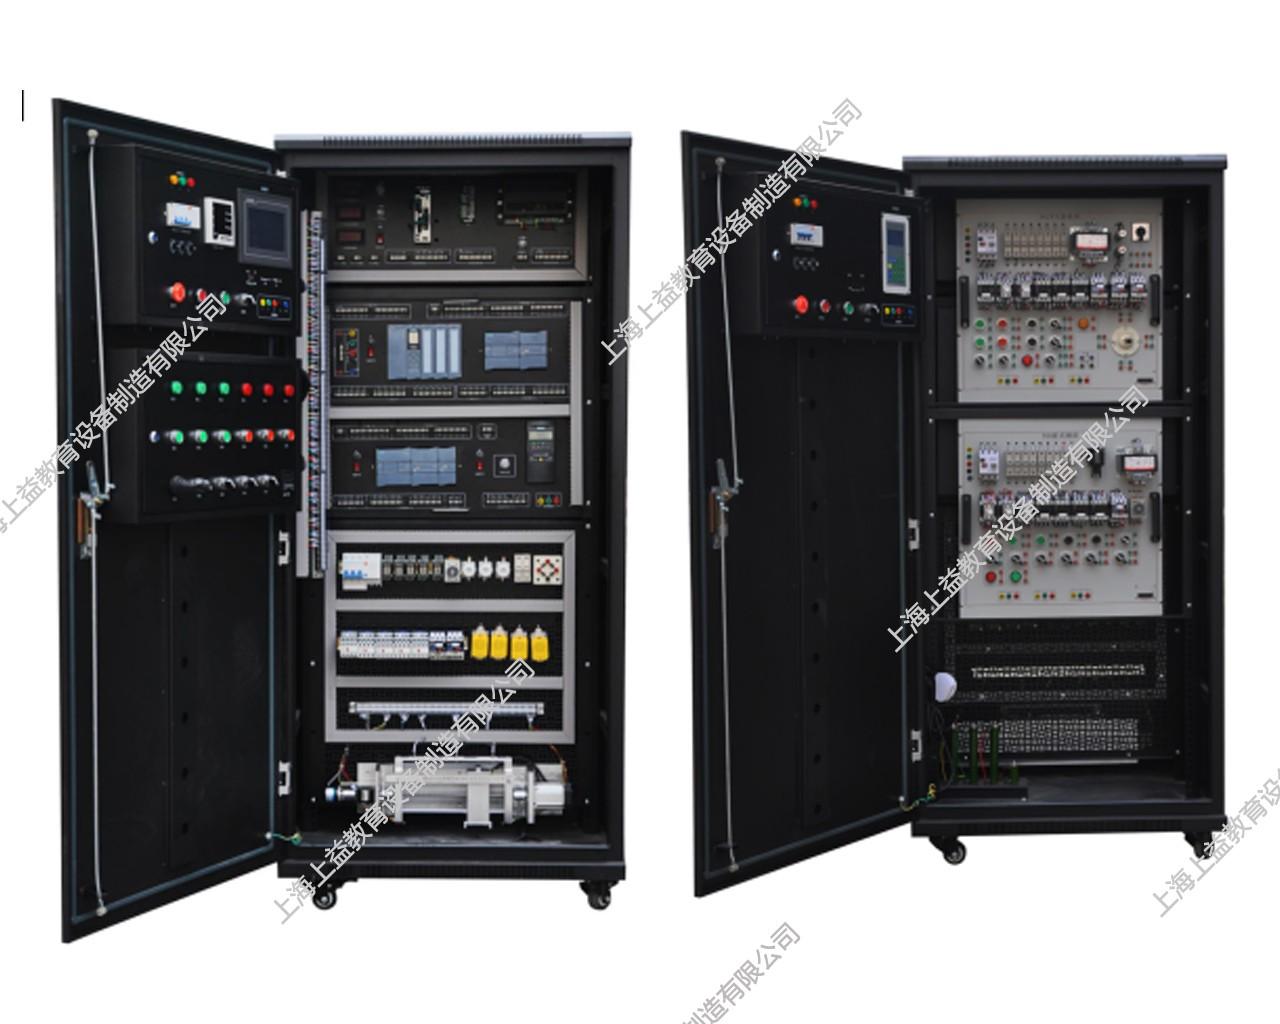 SYGK-01B现代电气控制系统安装与调试wwwlehu8viplehu68vip装置(双面)